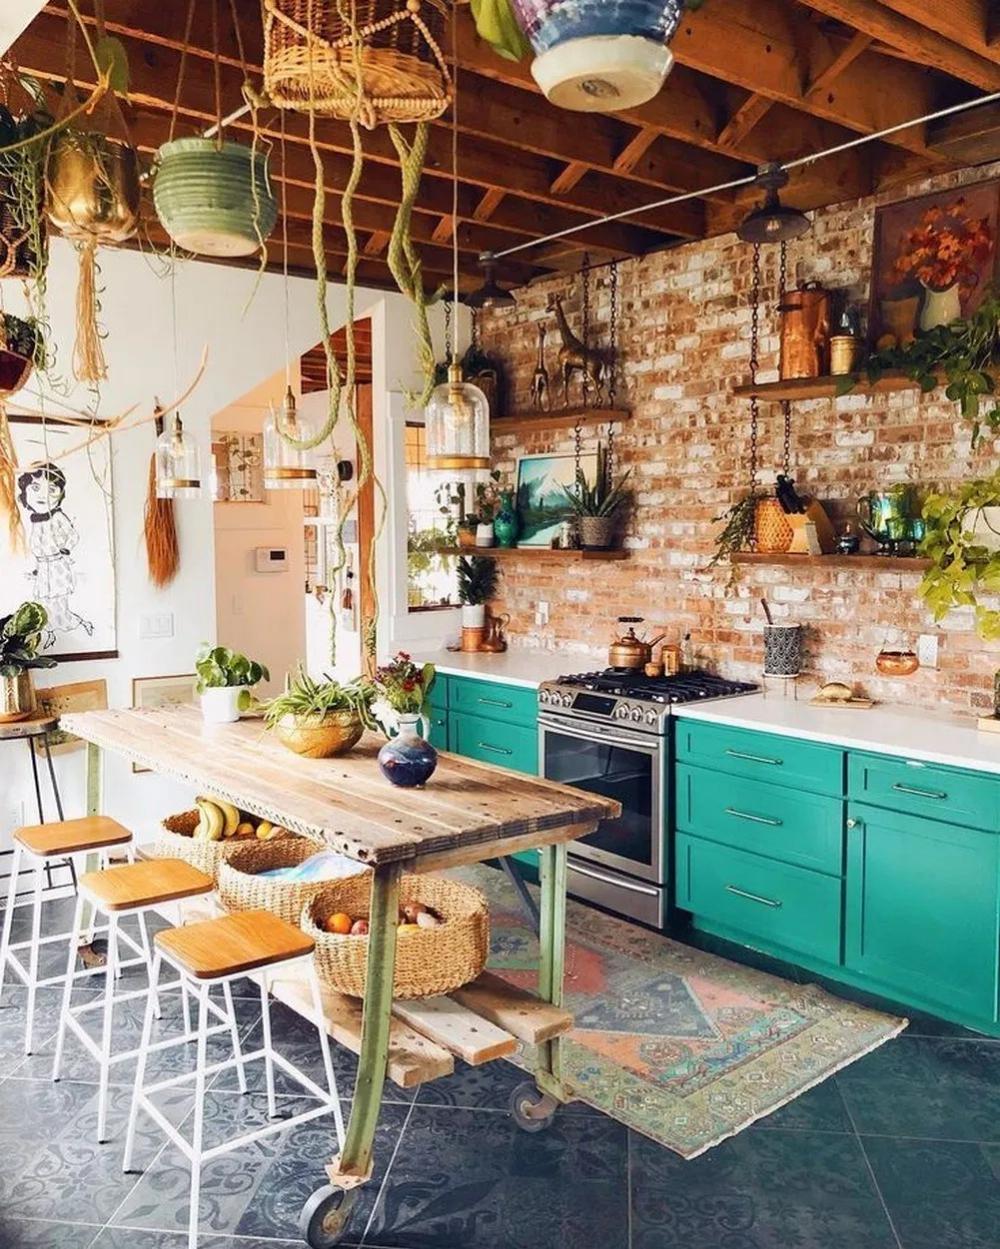 37 design ideas for boho style kitchens 2 kitchen bohokitchen kitchendesign ideas hasinfo on kitchen interior boho id=82012